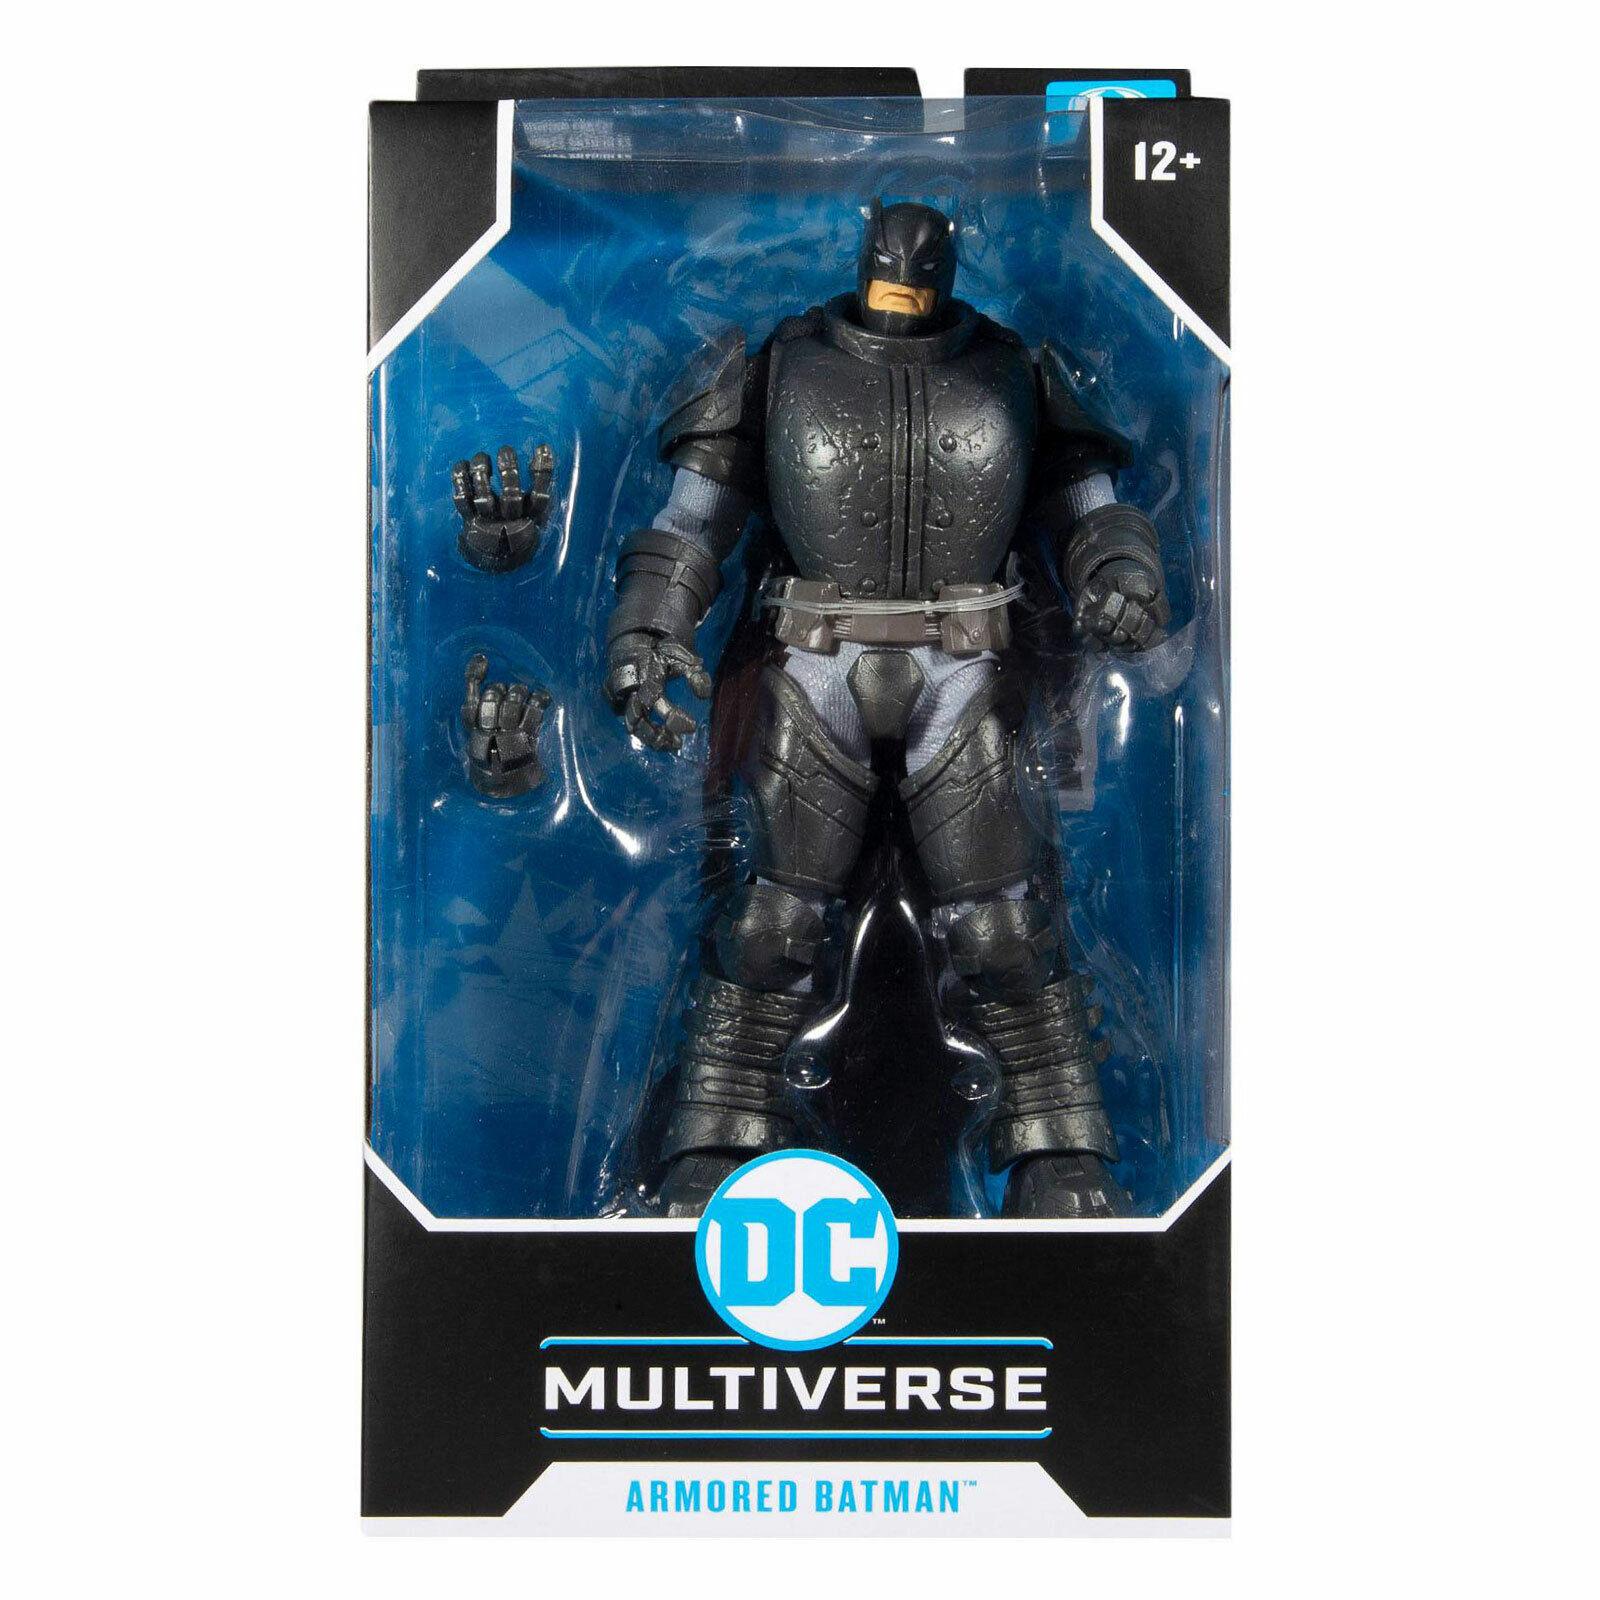 McFarlane Toys DC Multiverse The Dark Knight Returns Armored Batman 18 cm